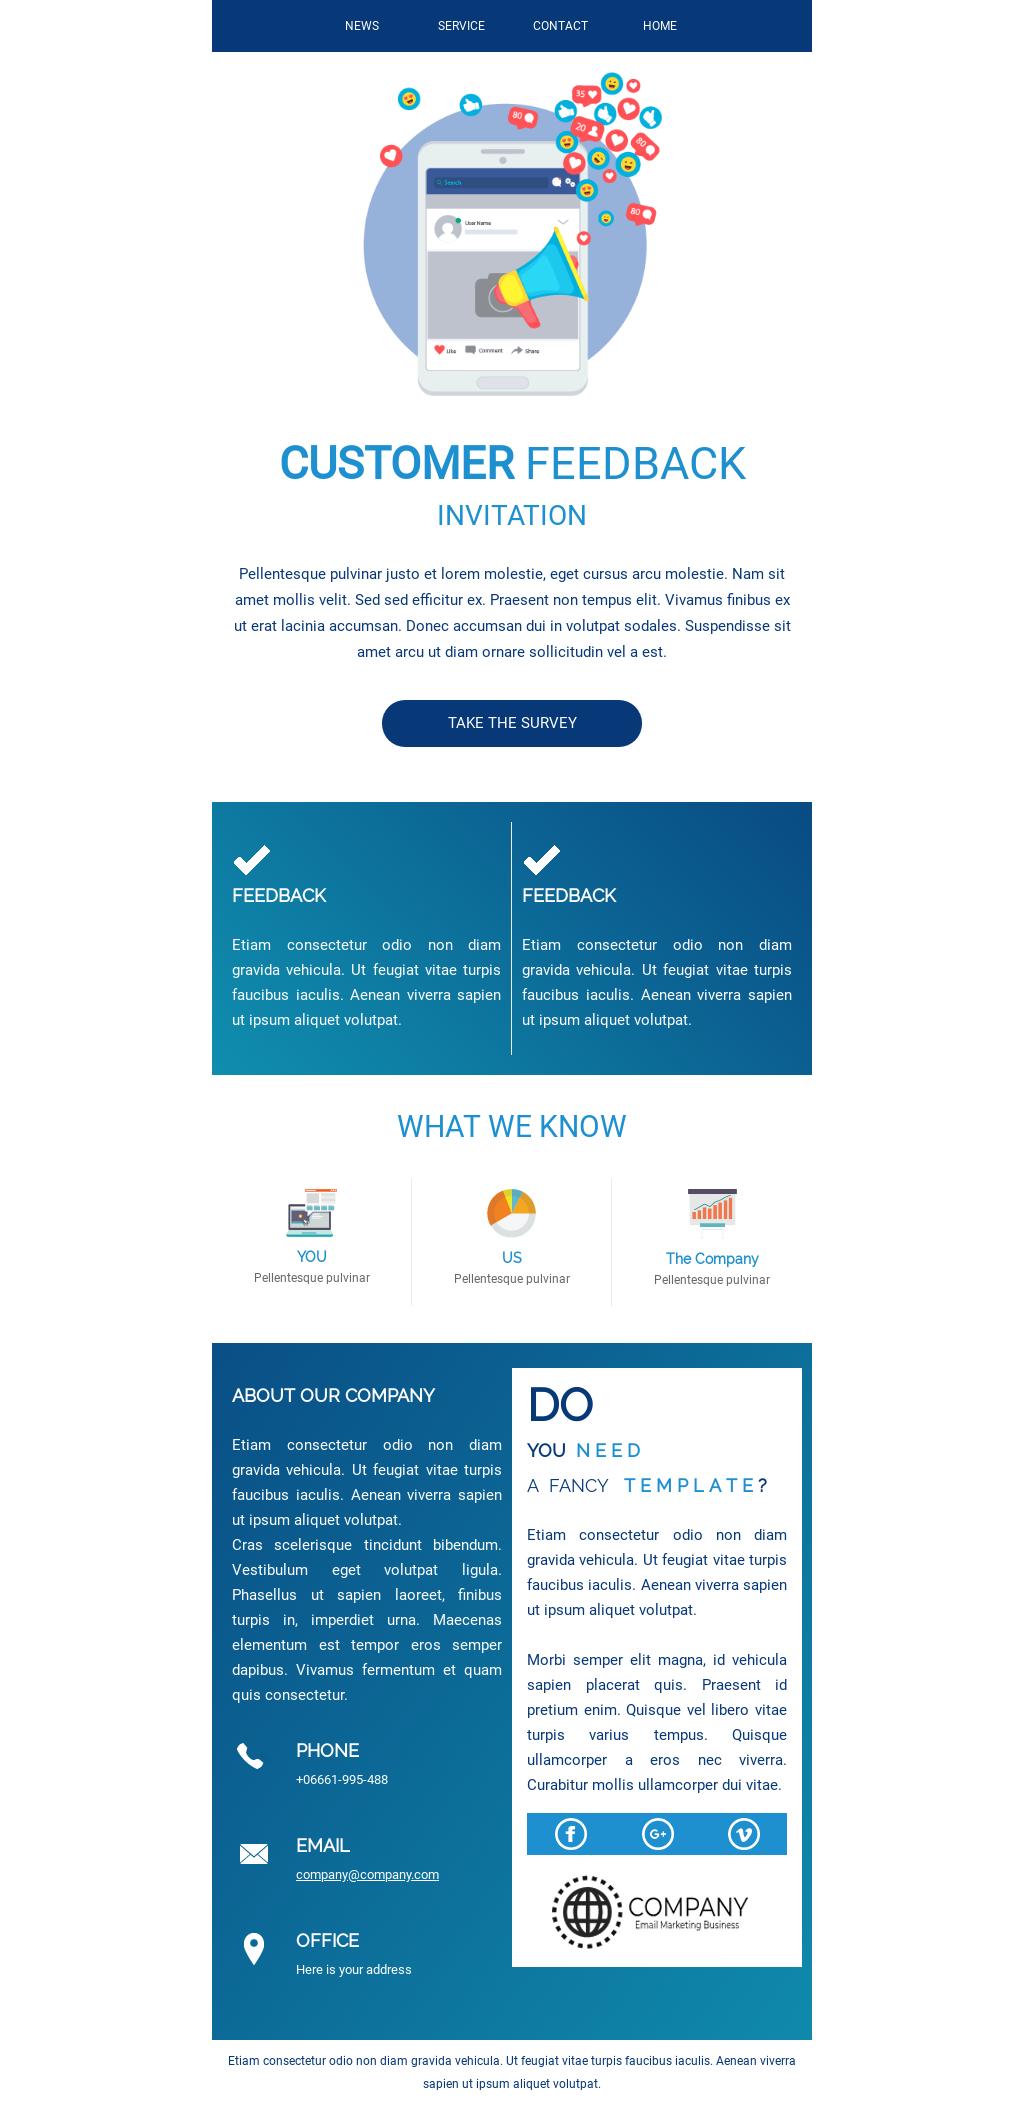 Customer Feedback Survey Invitation Email Template